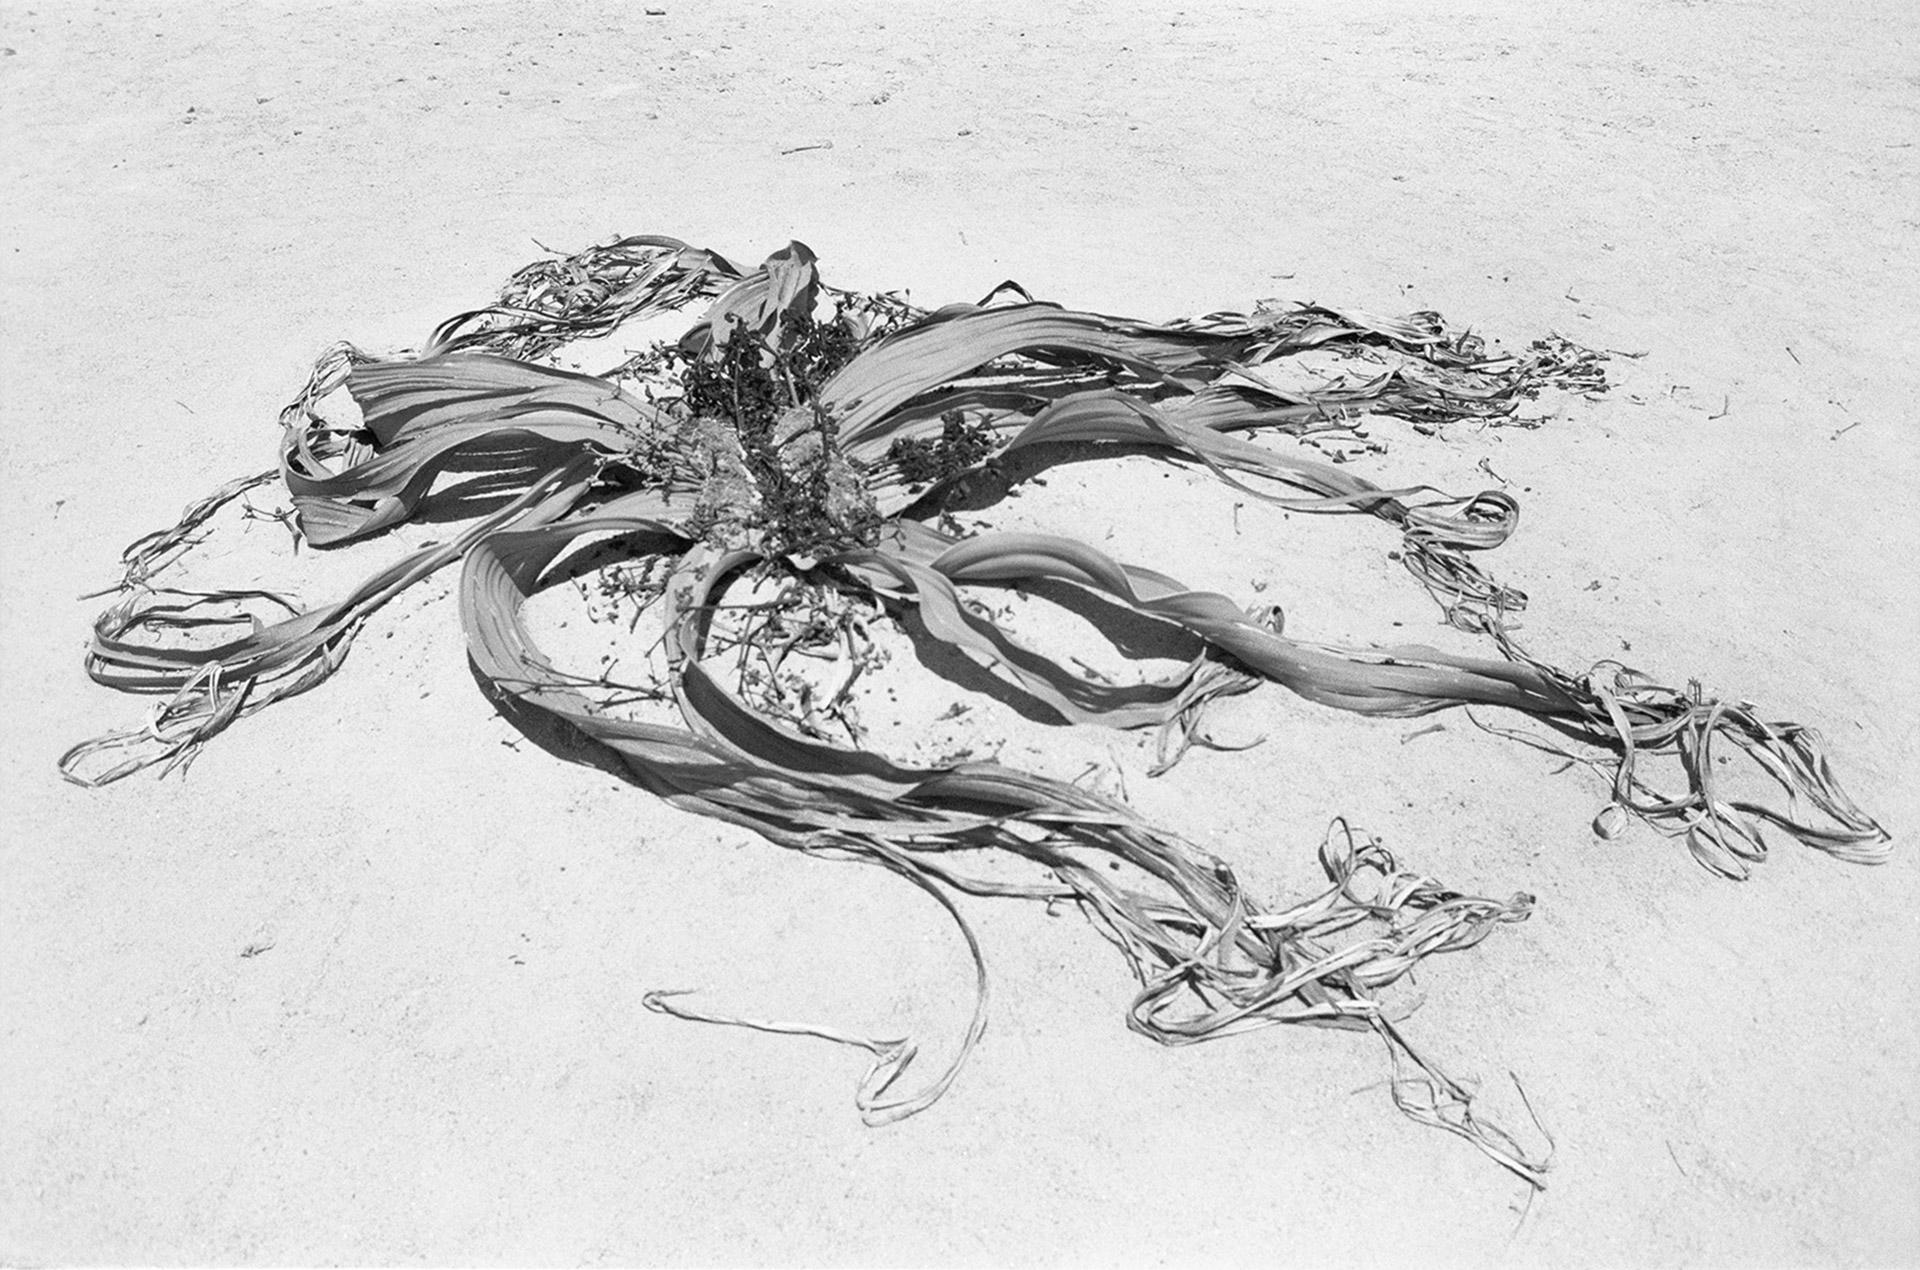 Kopie von Una-Szeemann-Kunsthalle-Winterthur-2018-4